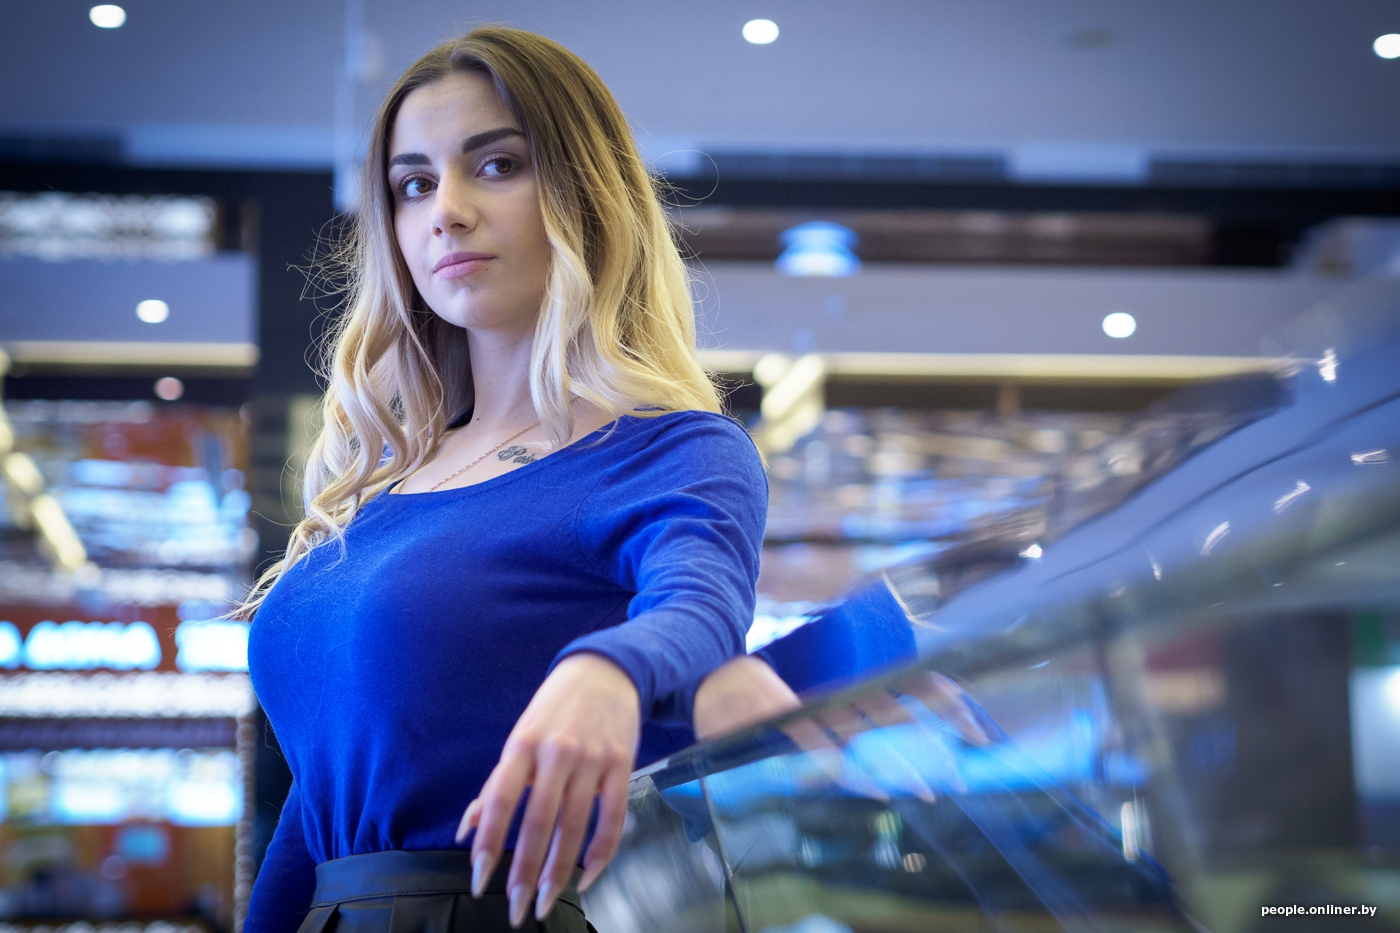 Paola Stripping – Паола Стрипинг – дерзкая звезда стриптиза с голыми сиськами порно звезда